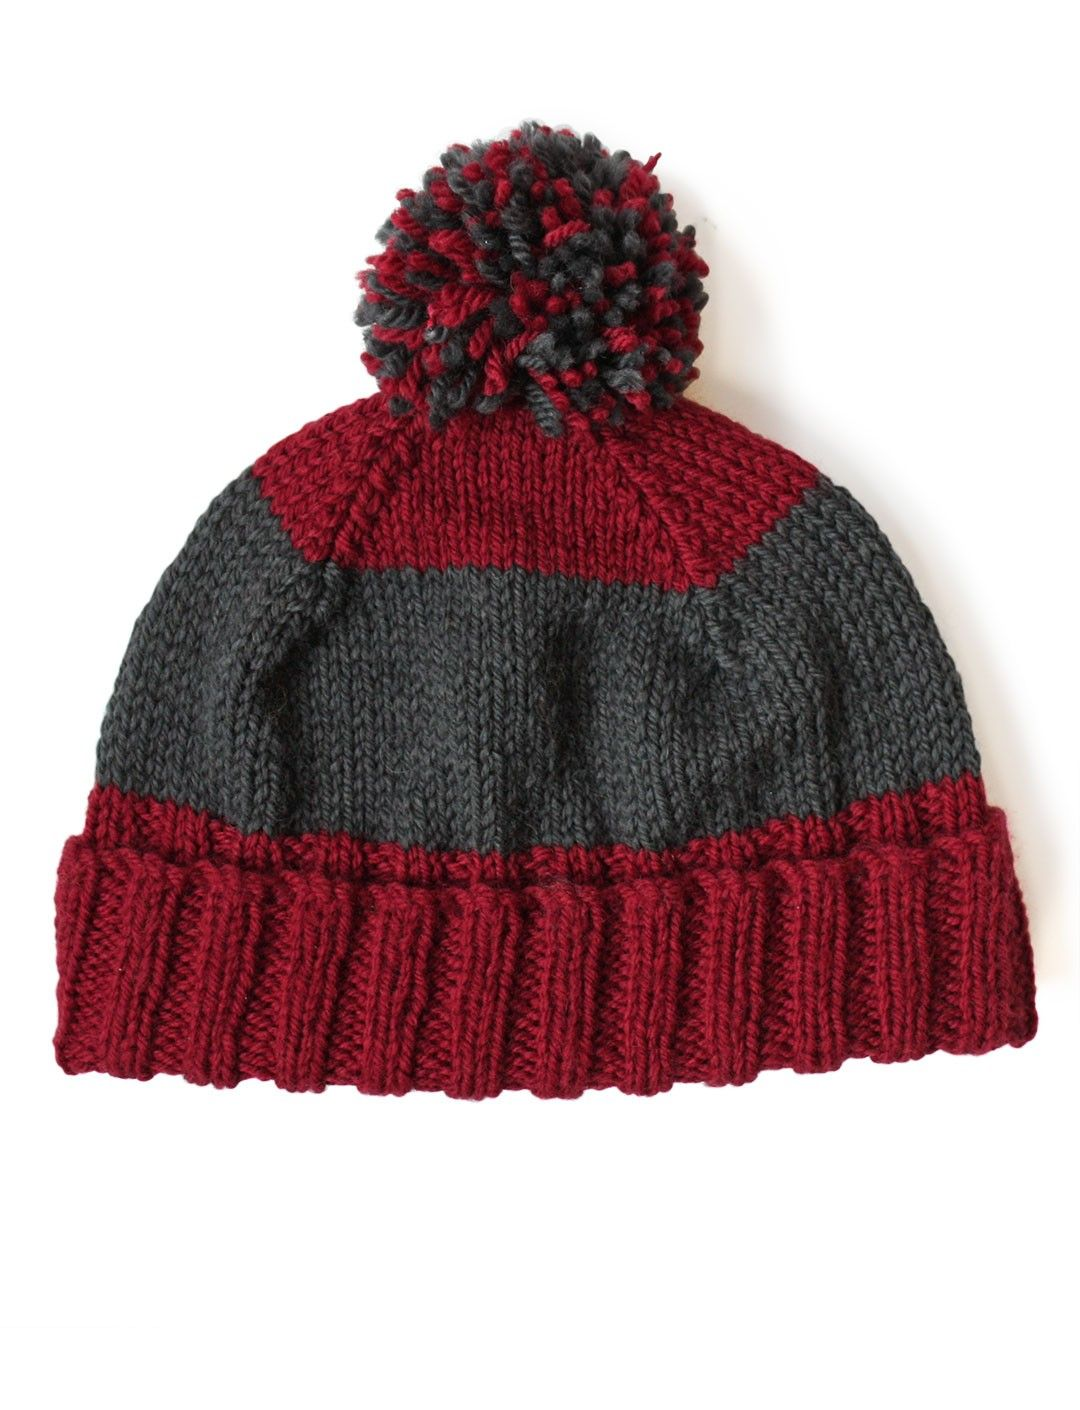 Yarnspirations.com - Patons Beat the Bands Hat - Patterns ...